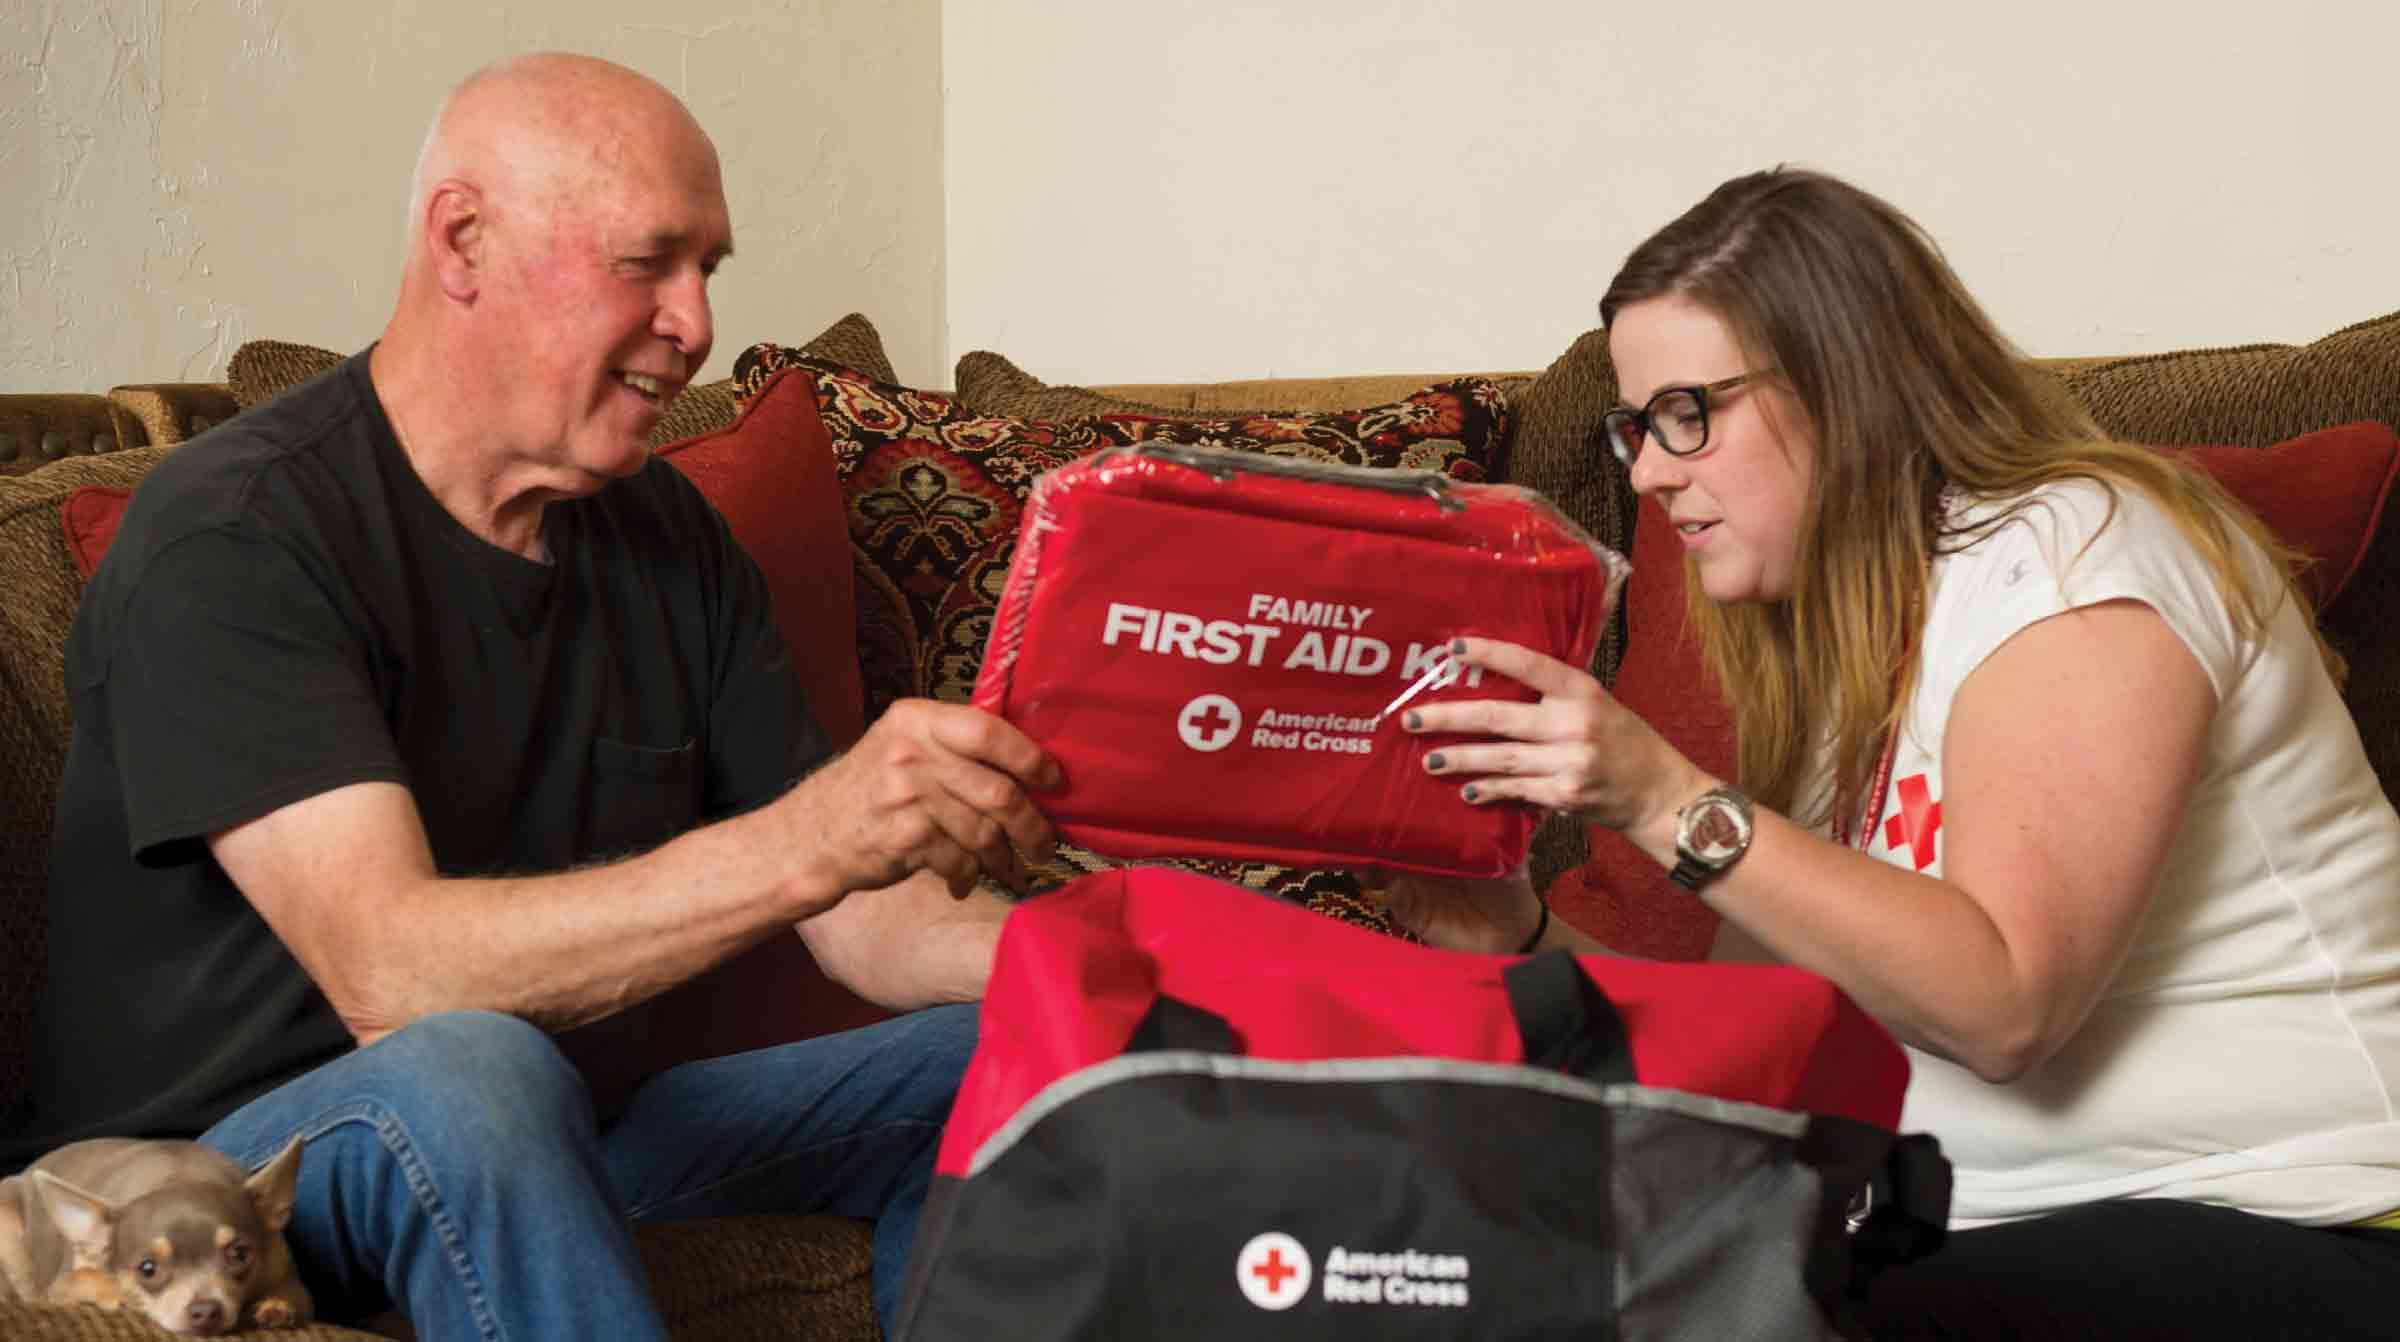 Family discusses emergency preparedness plan